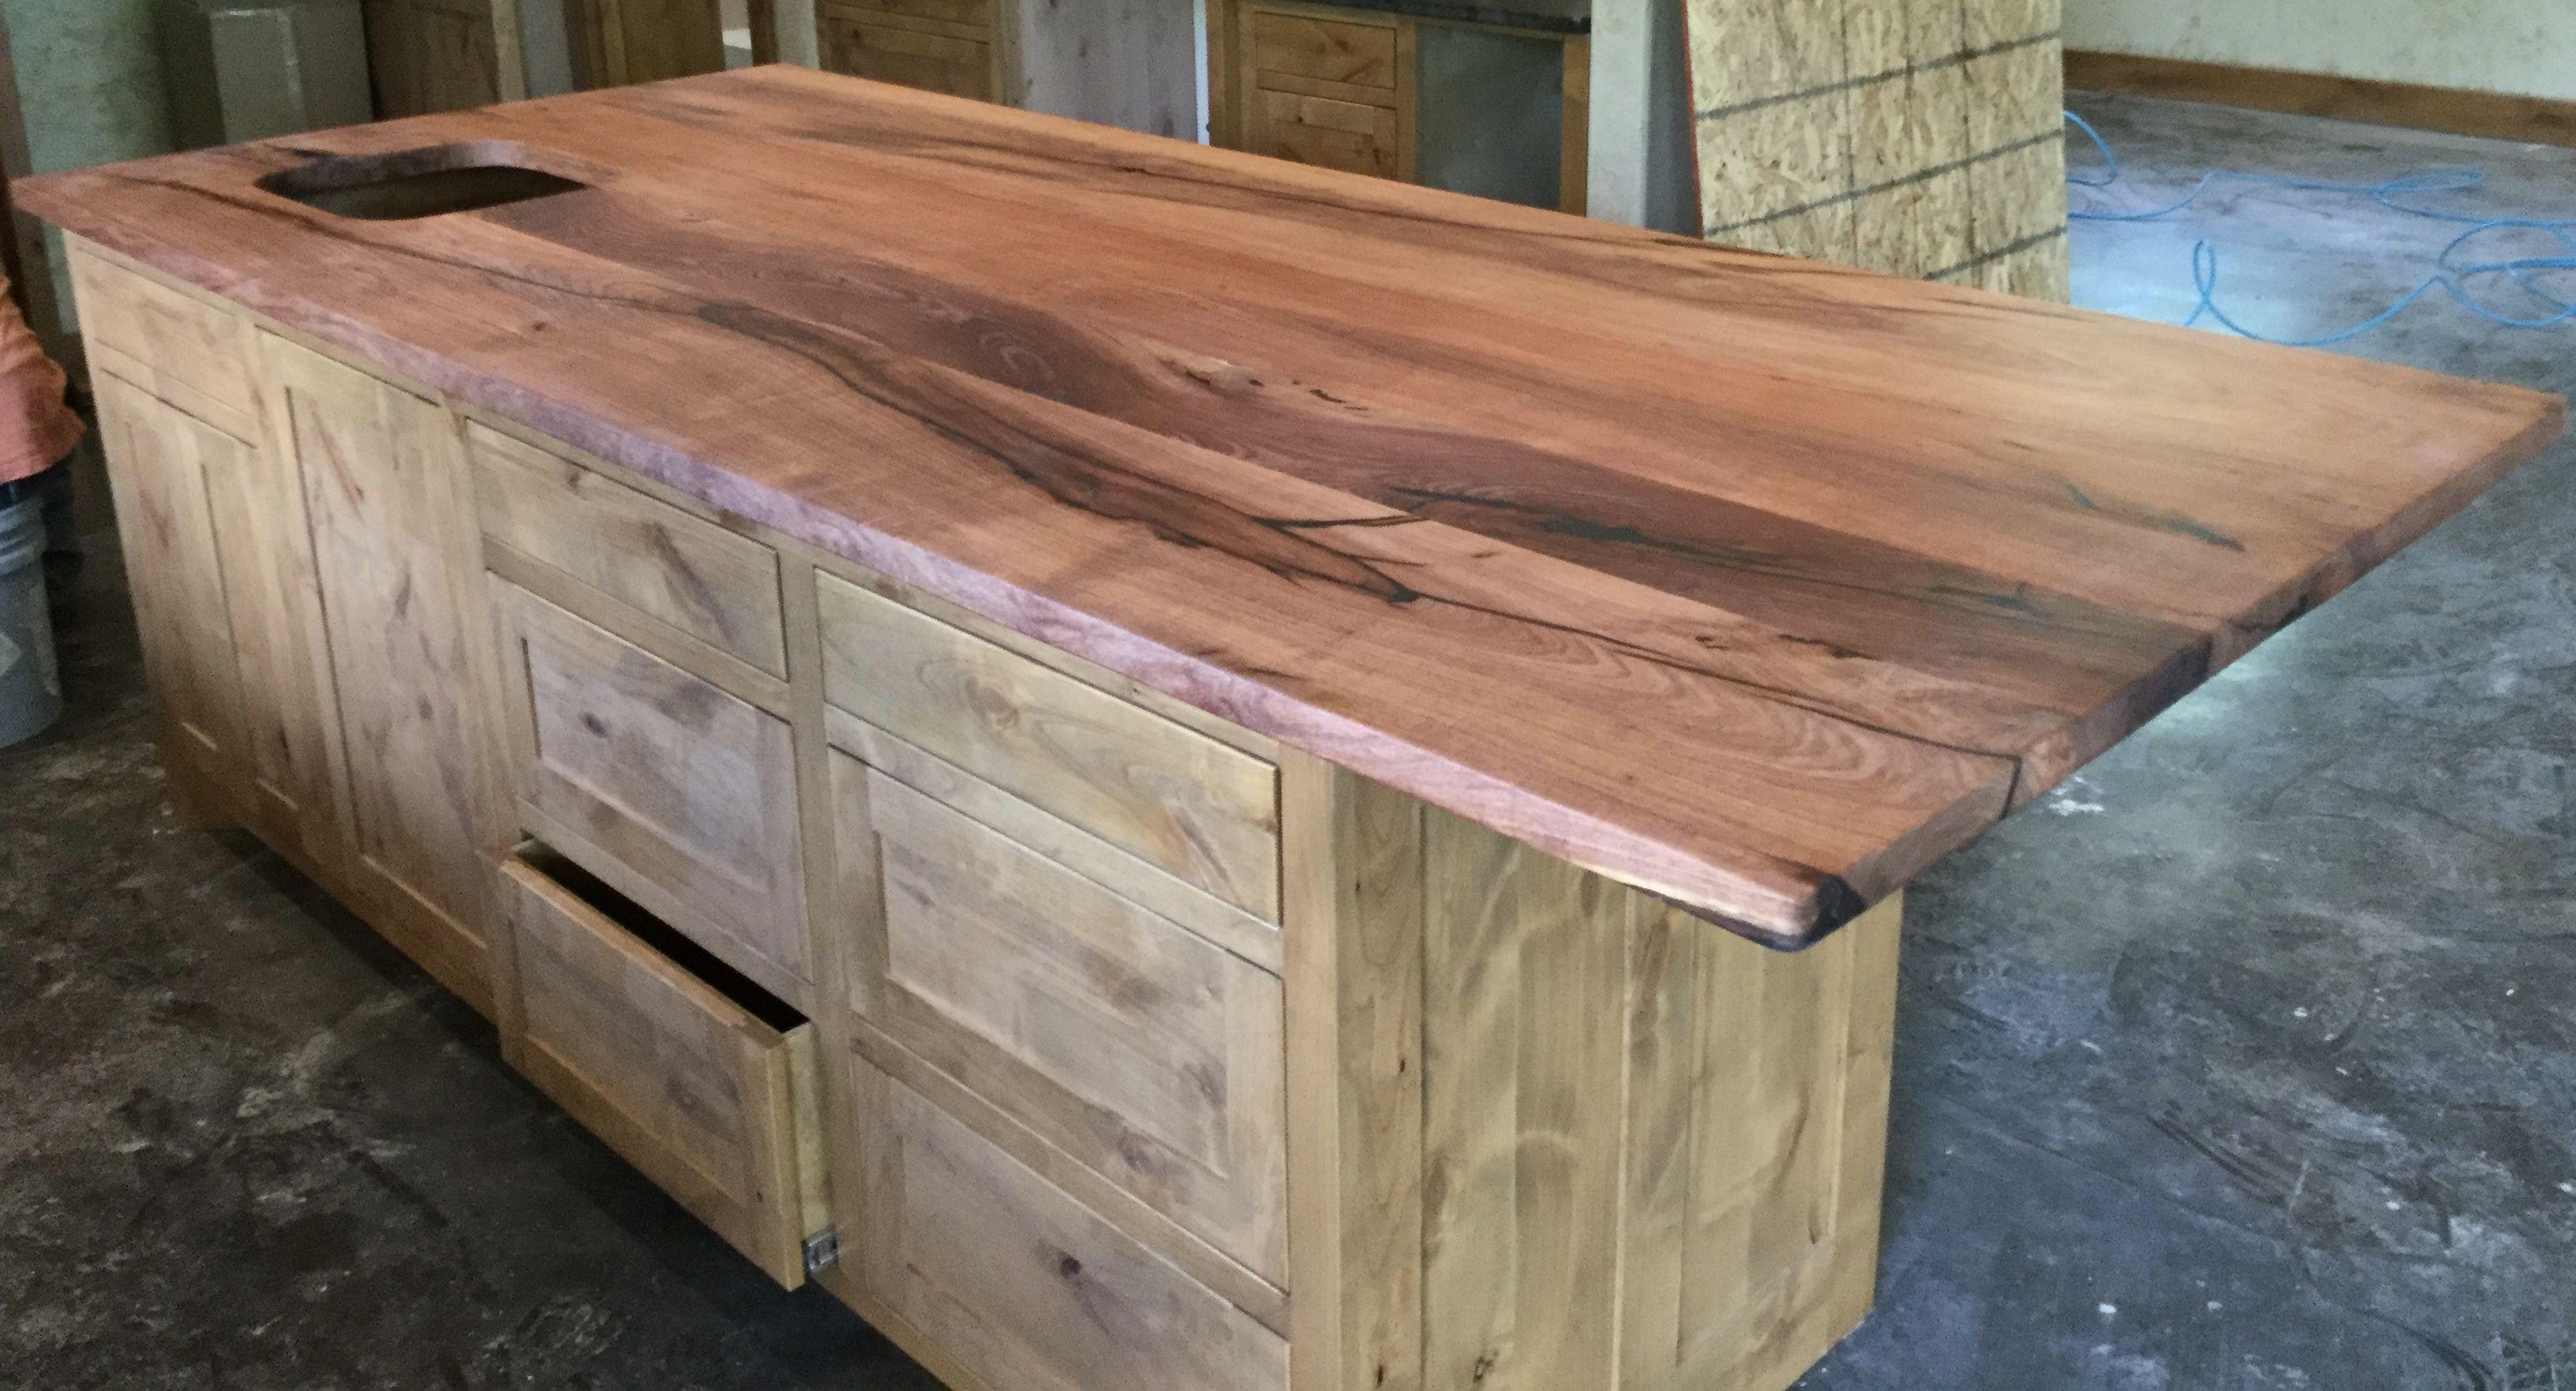 Mesquite Wood Countertop Interior Paint Colors Interior Color Schemes Wood Countertops